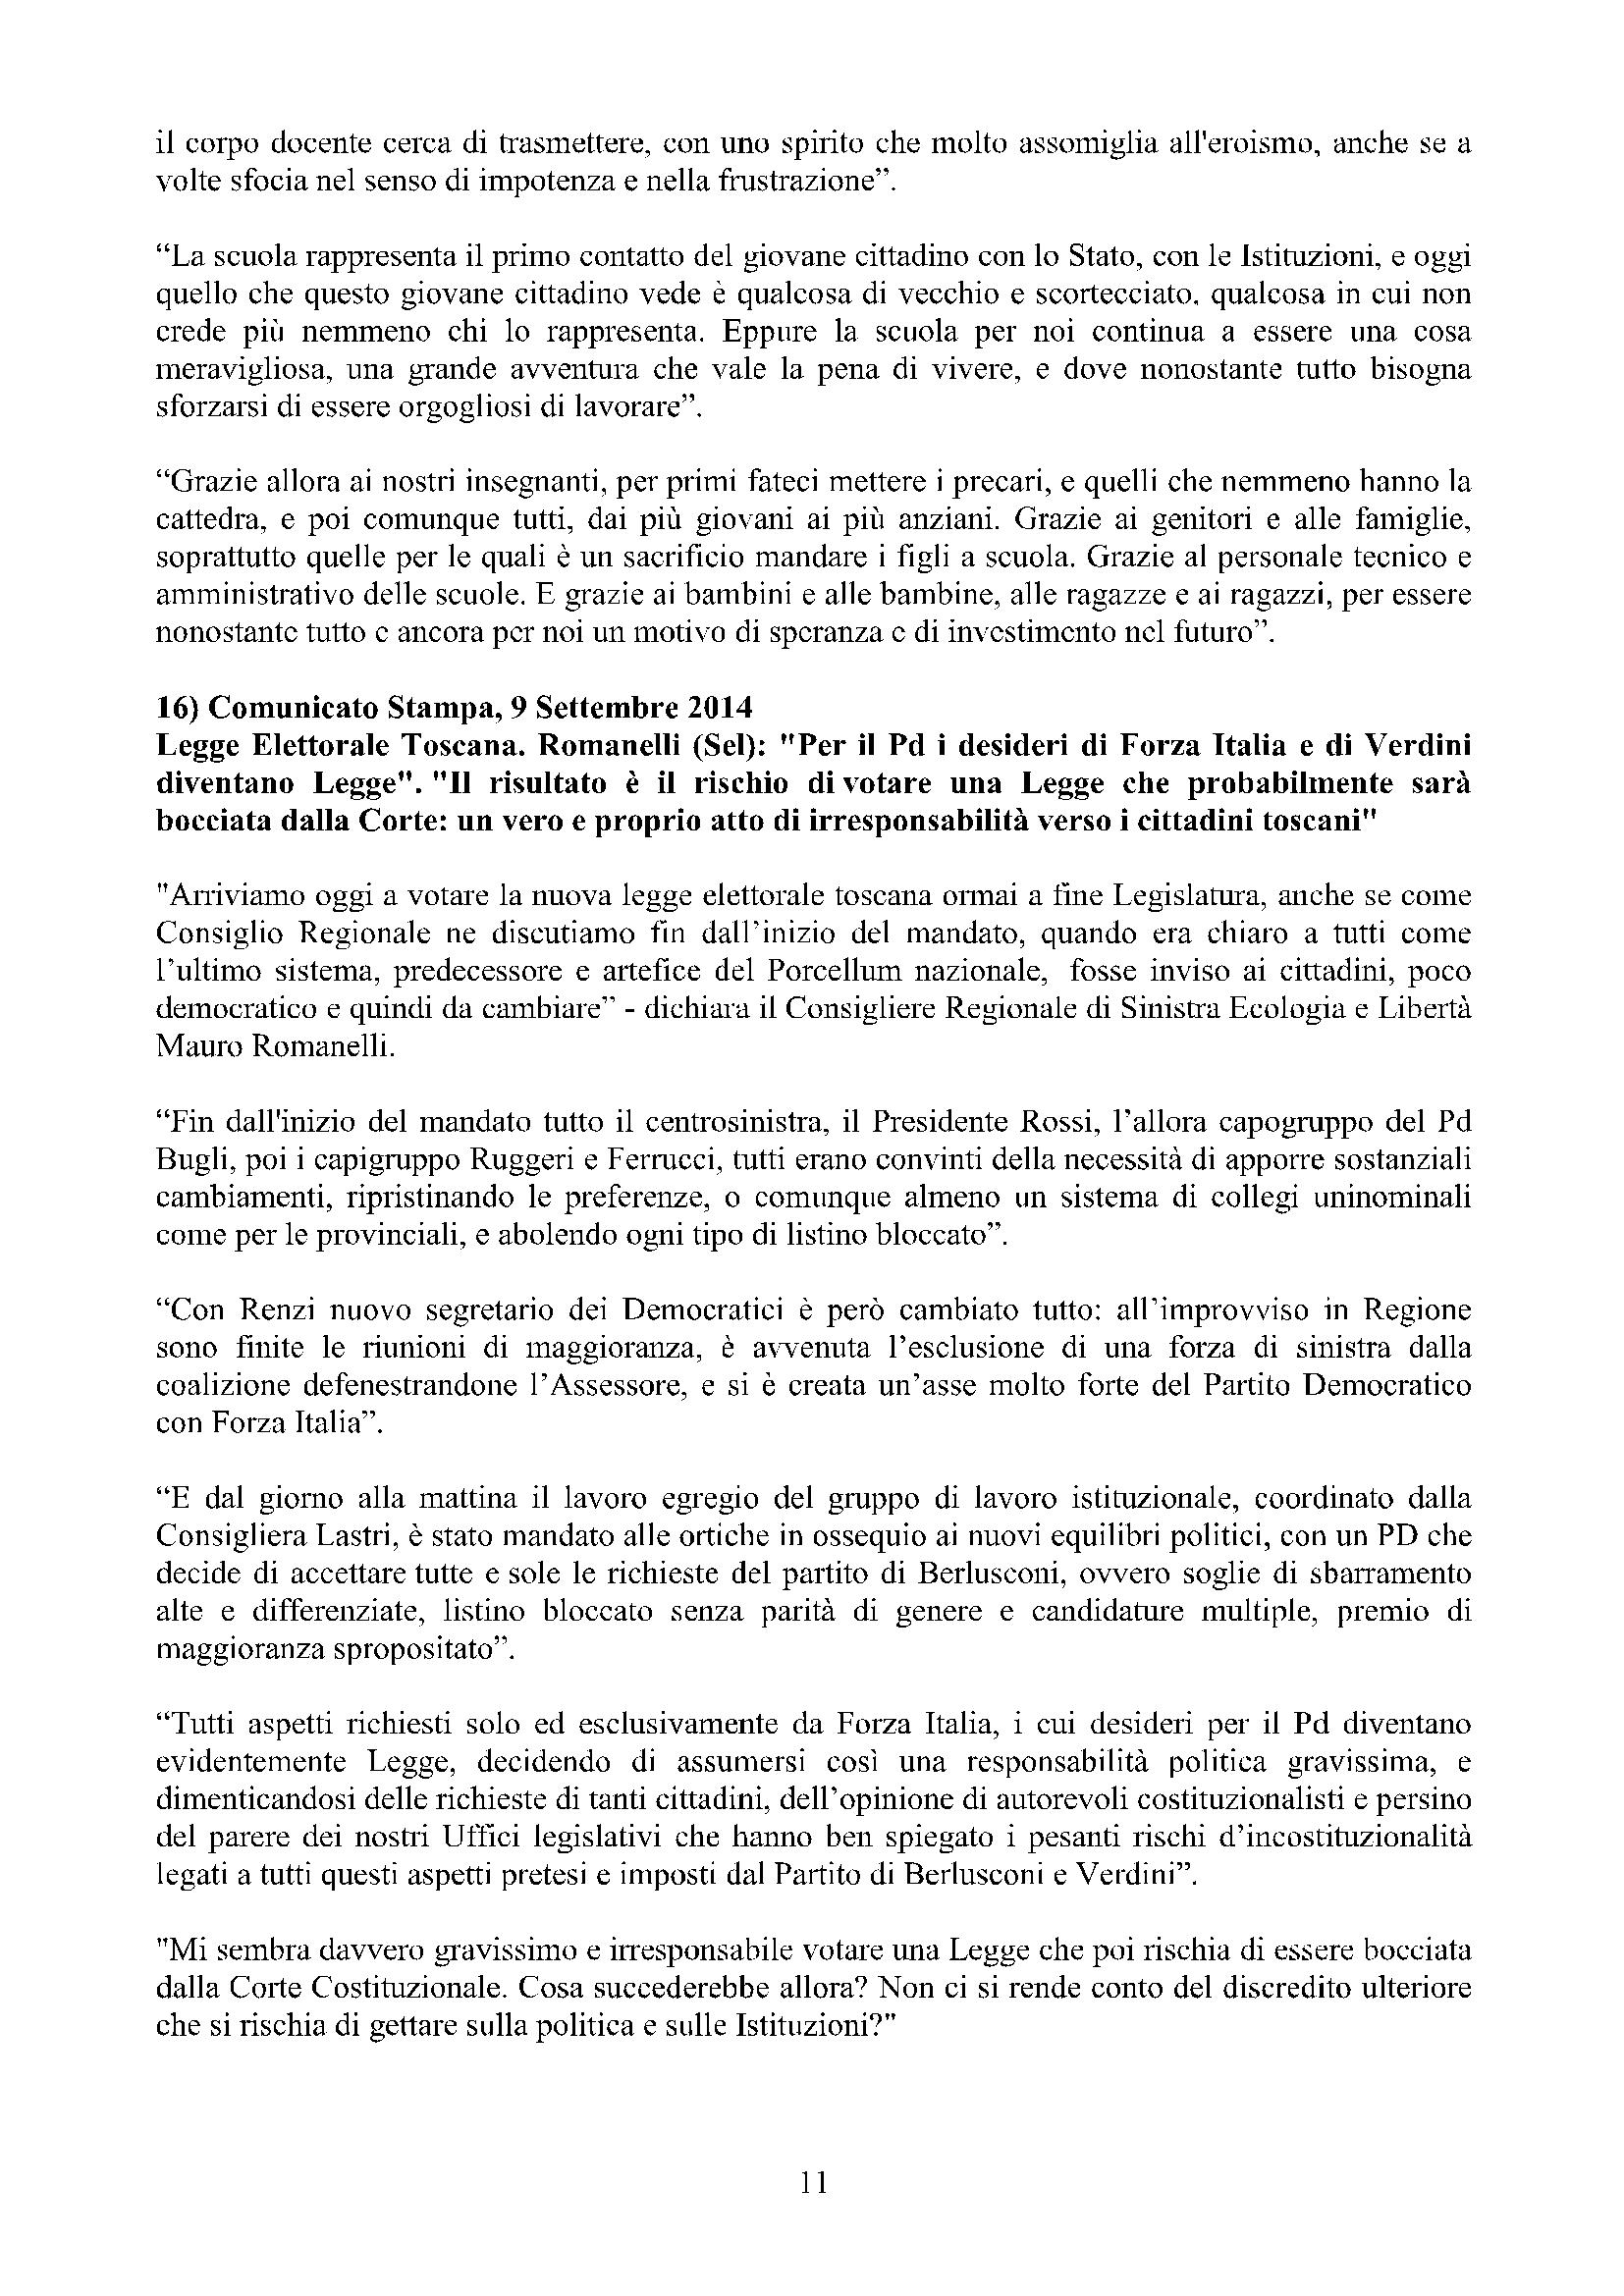 Newsletter di MAURO ROMANELLI Ottobre 2014 – 11